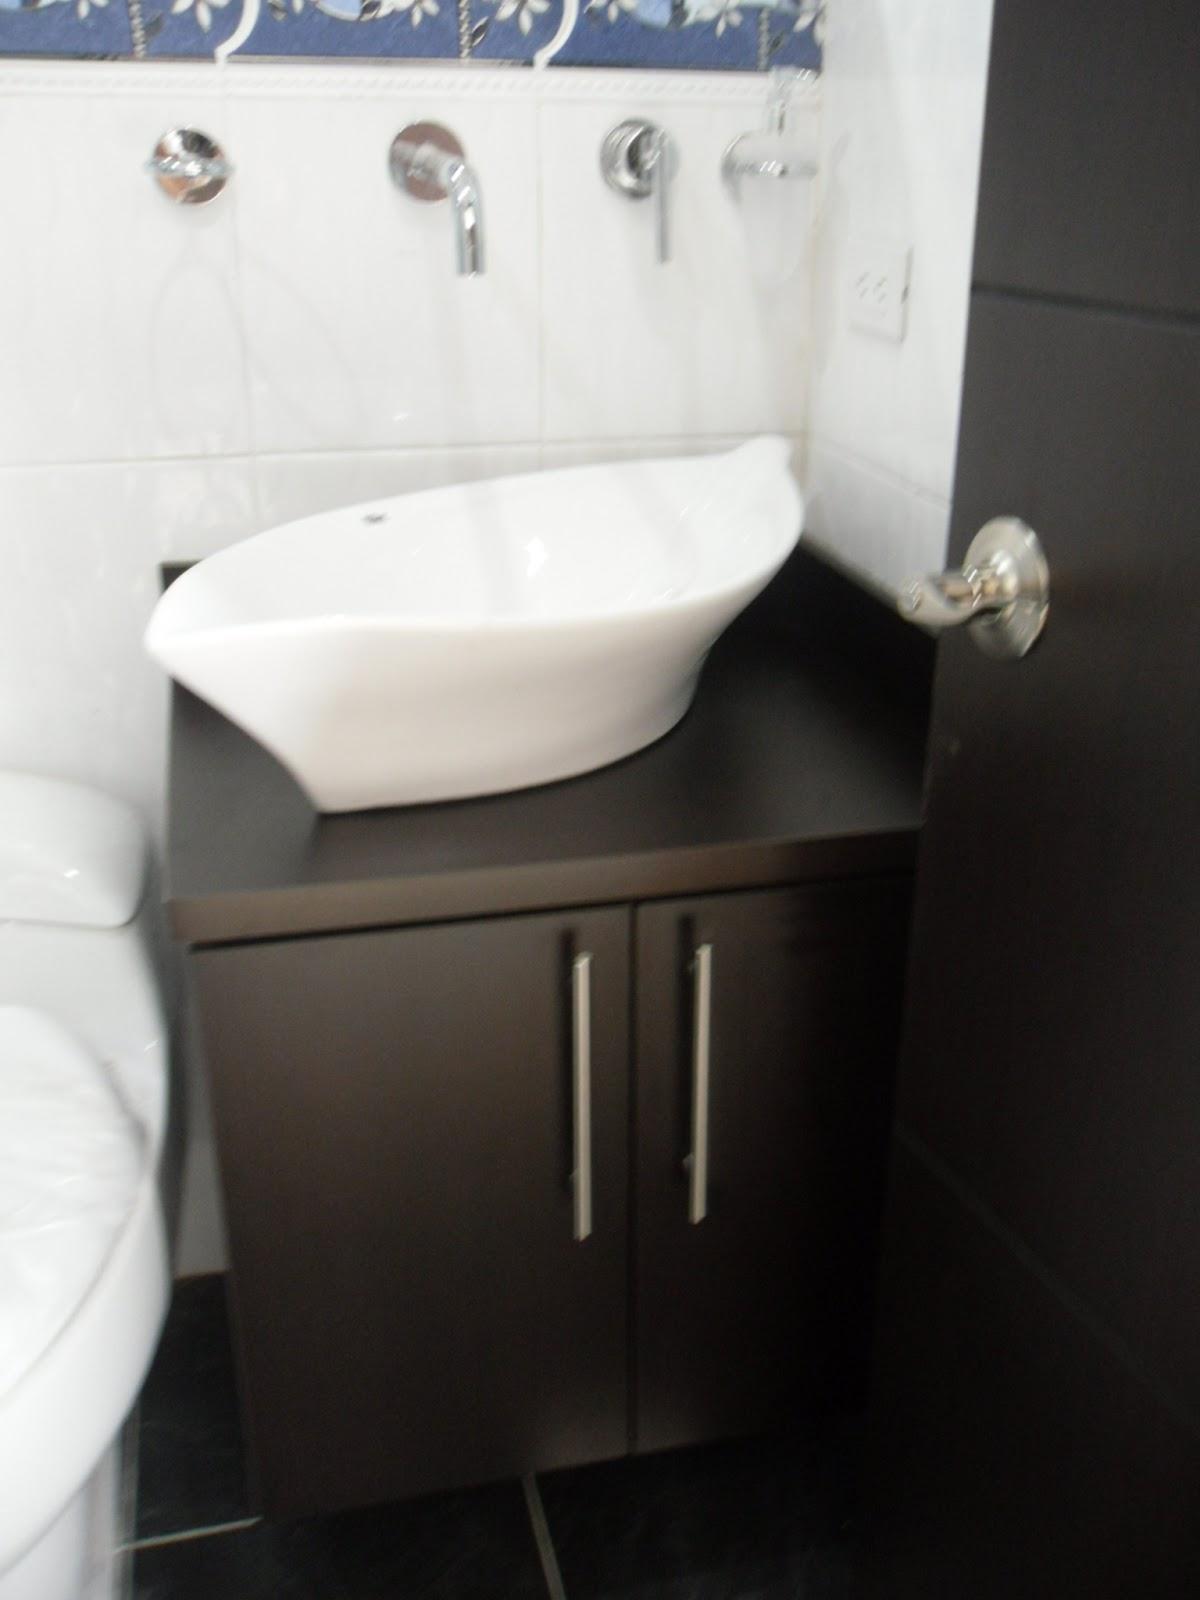 Imagenes de muebles para lavamanos modernos - Fotos de muebles para banos ...